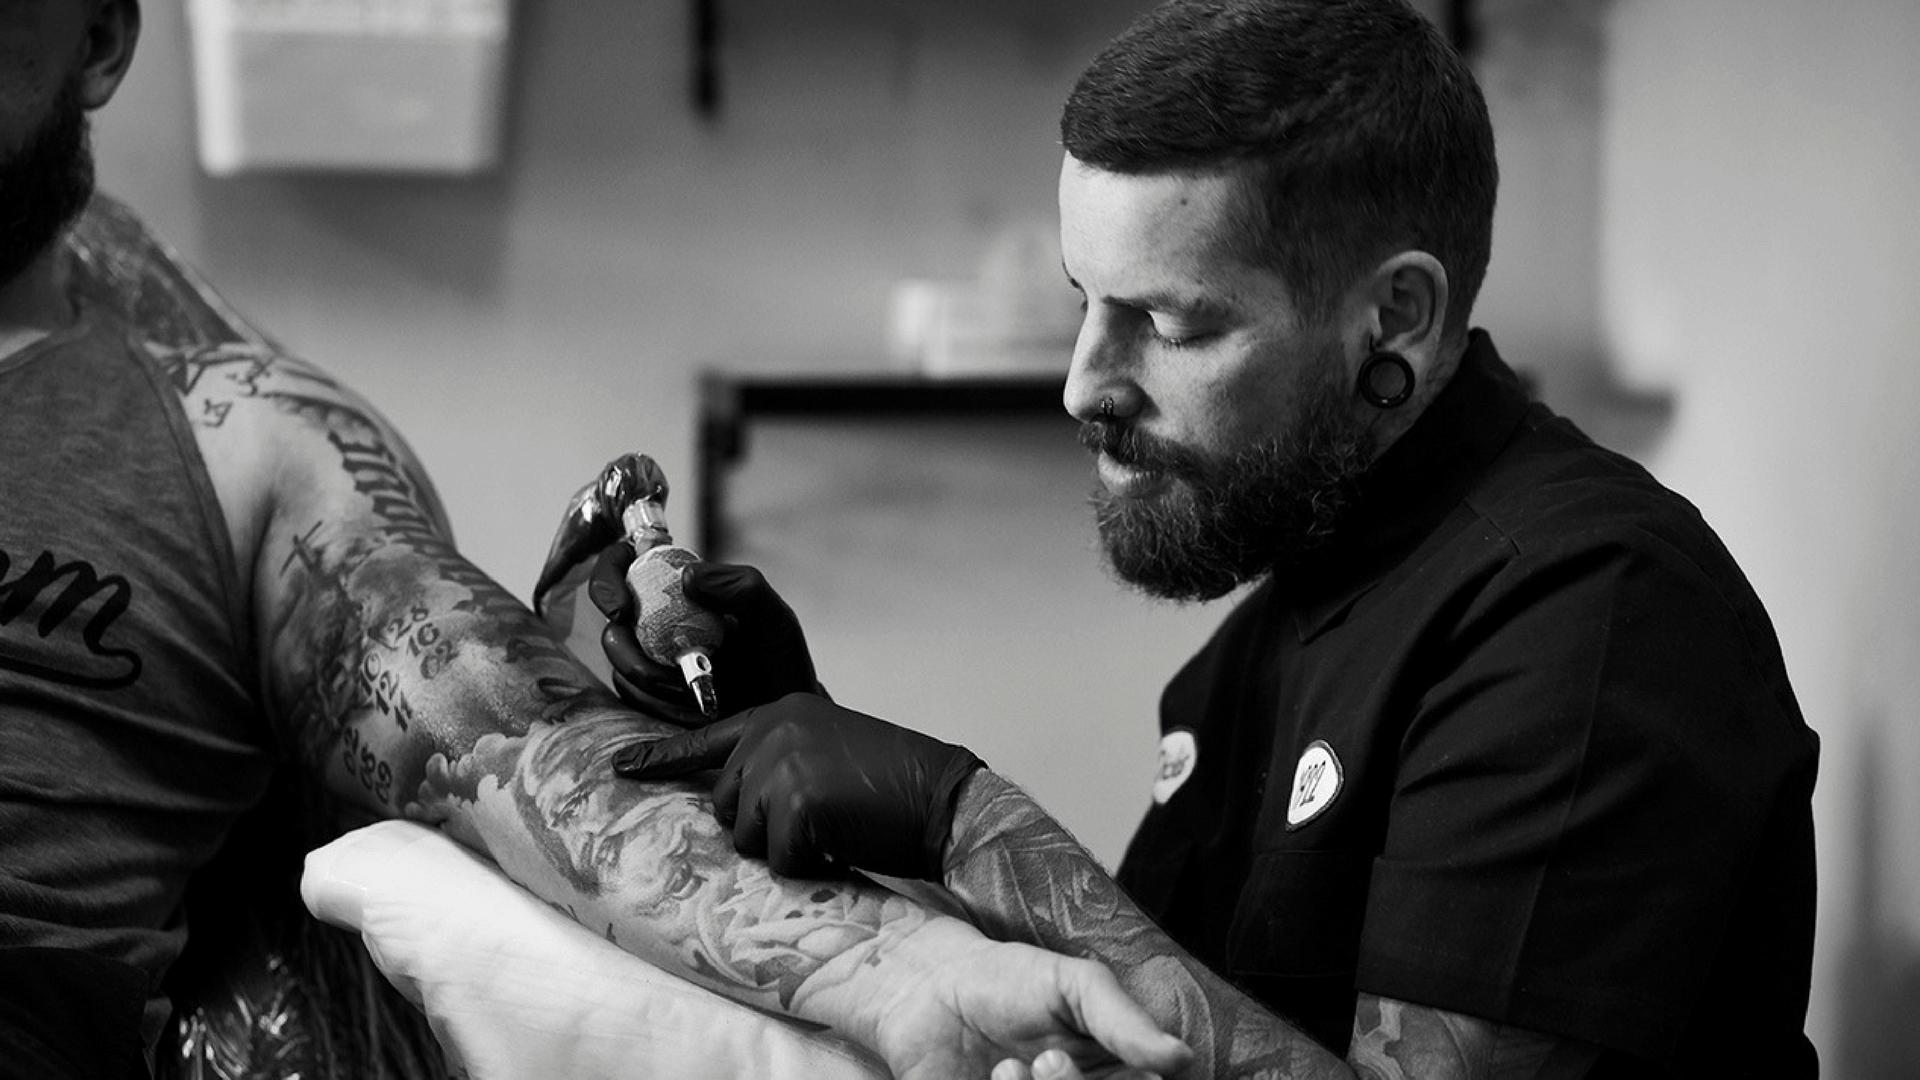 49a03897b 10 Top Tattoo Parlours in Johannesburg